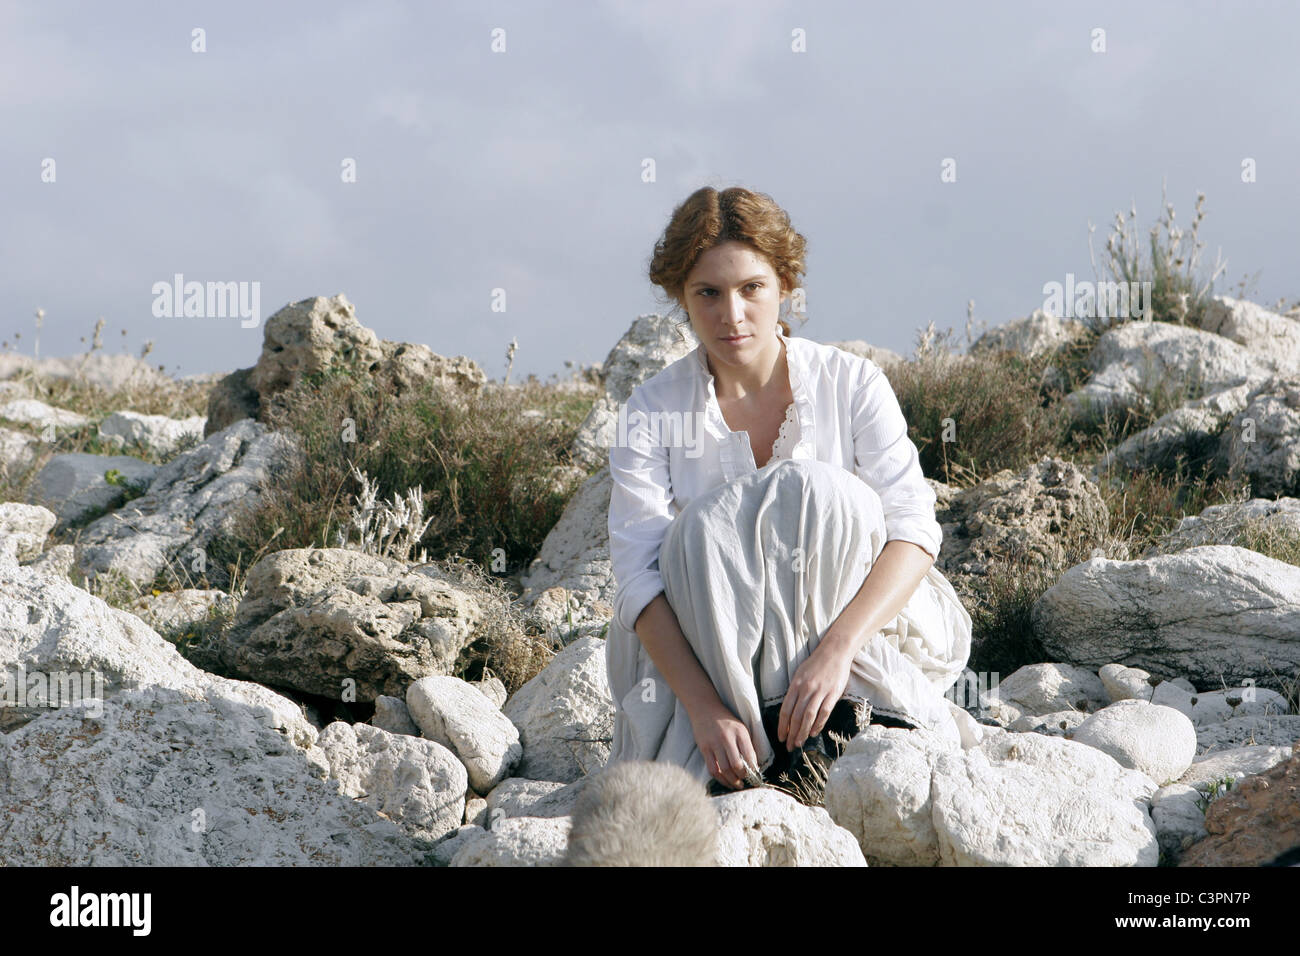 ISABELLA RAGONESE VIOLA DI MARE (2009) - Stock Image